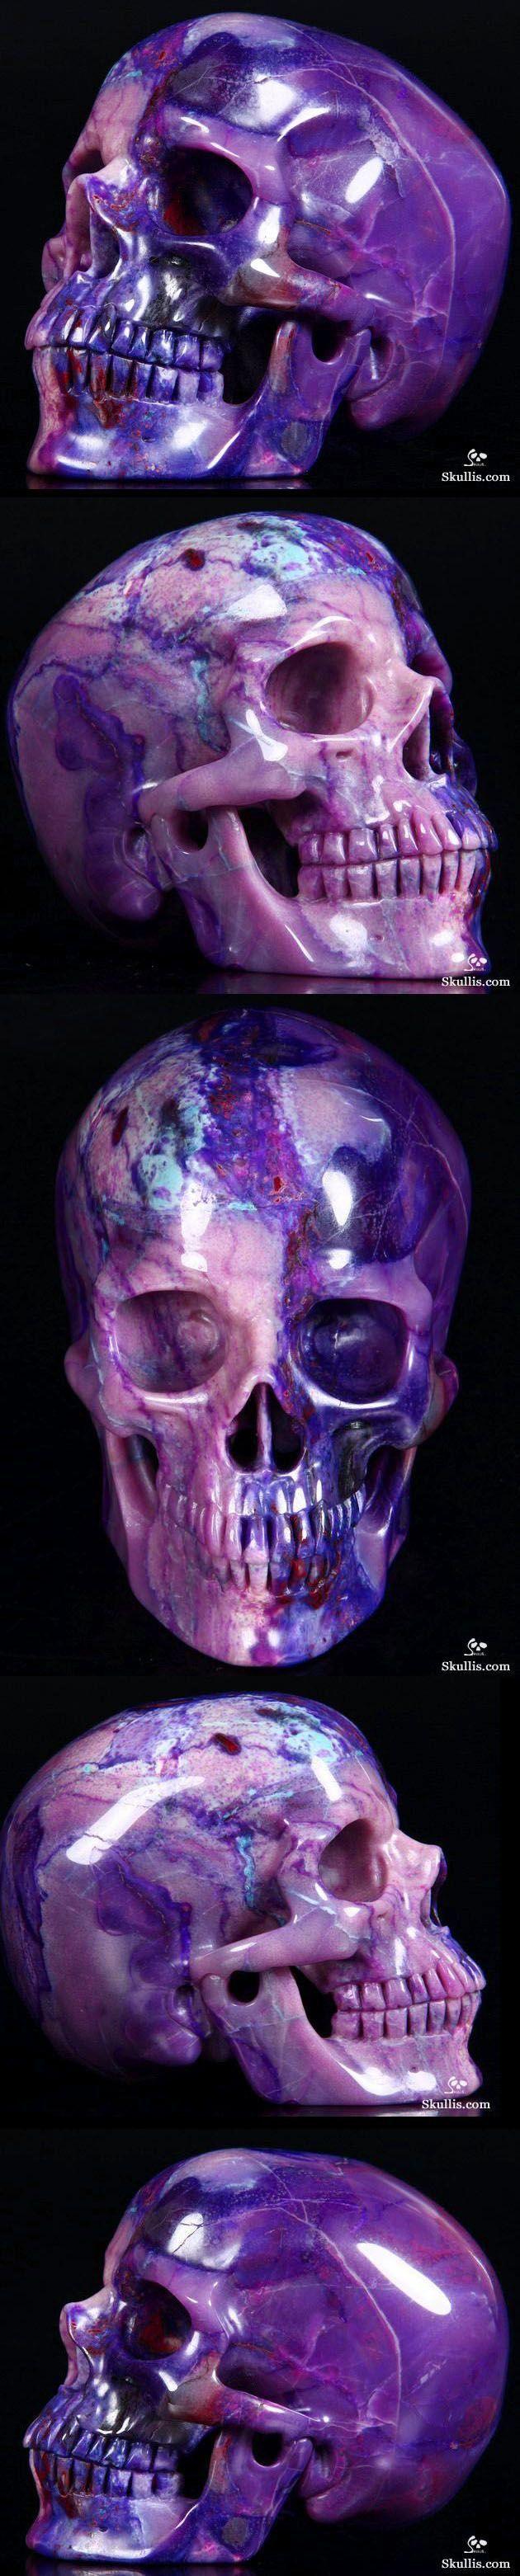 Cebé Scart-Crystal Violet 5sSBfkP4